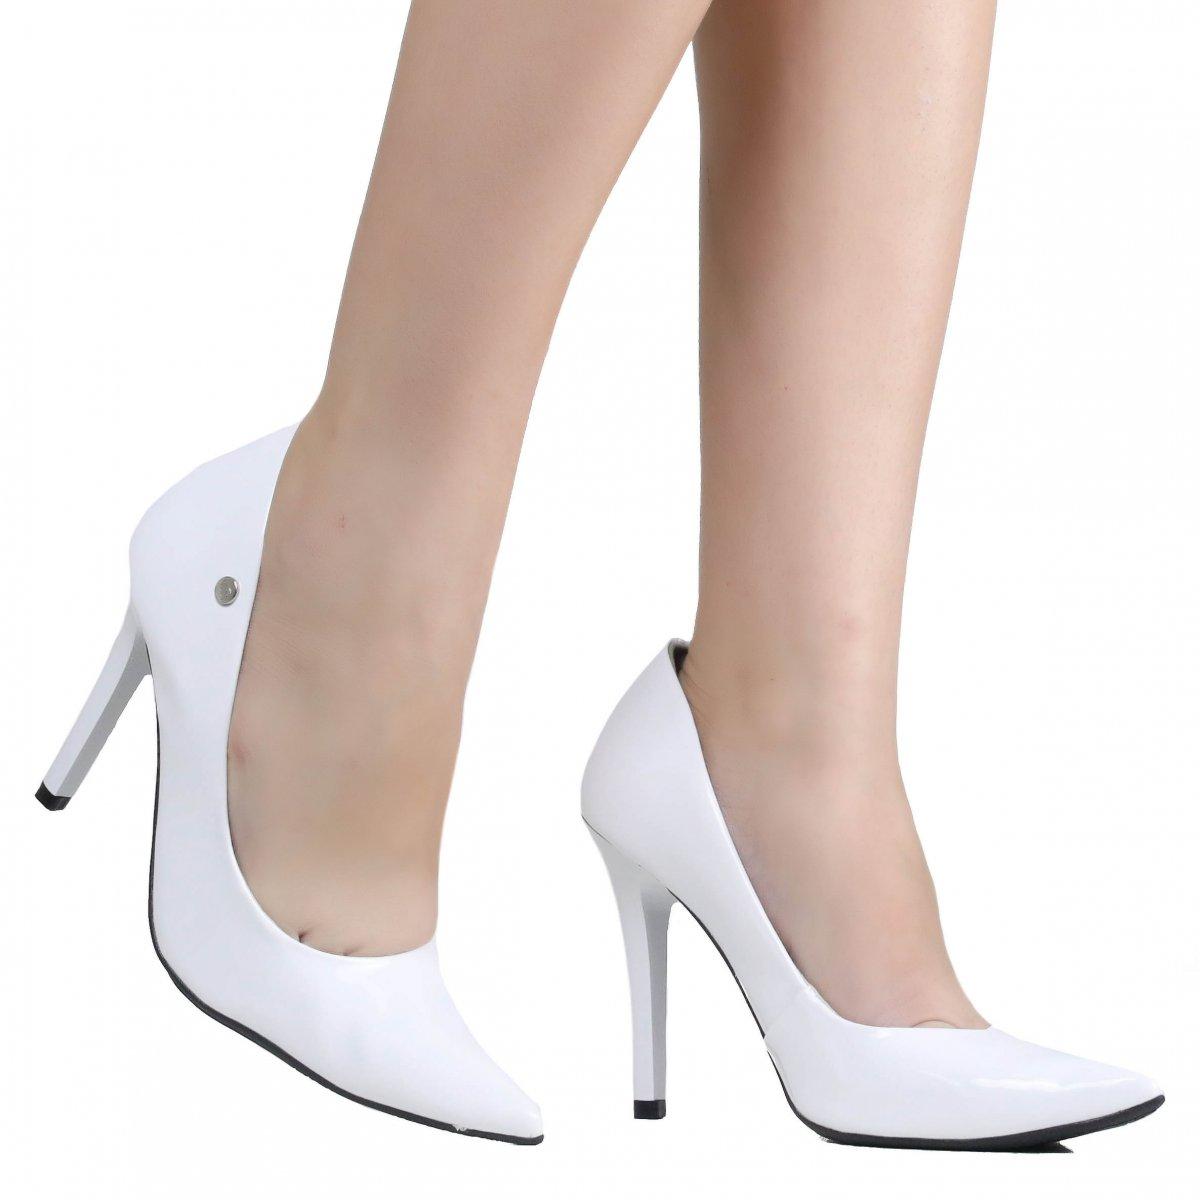 99f0a5c8e2 Sapato de Noivas Via Marte Scarpin 19-3102